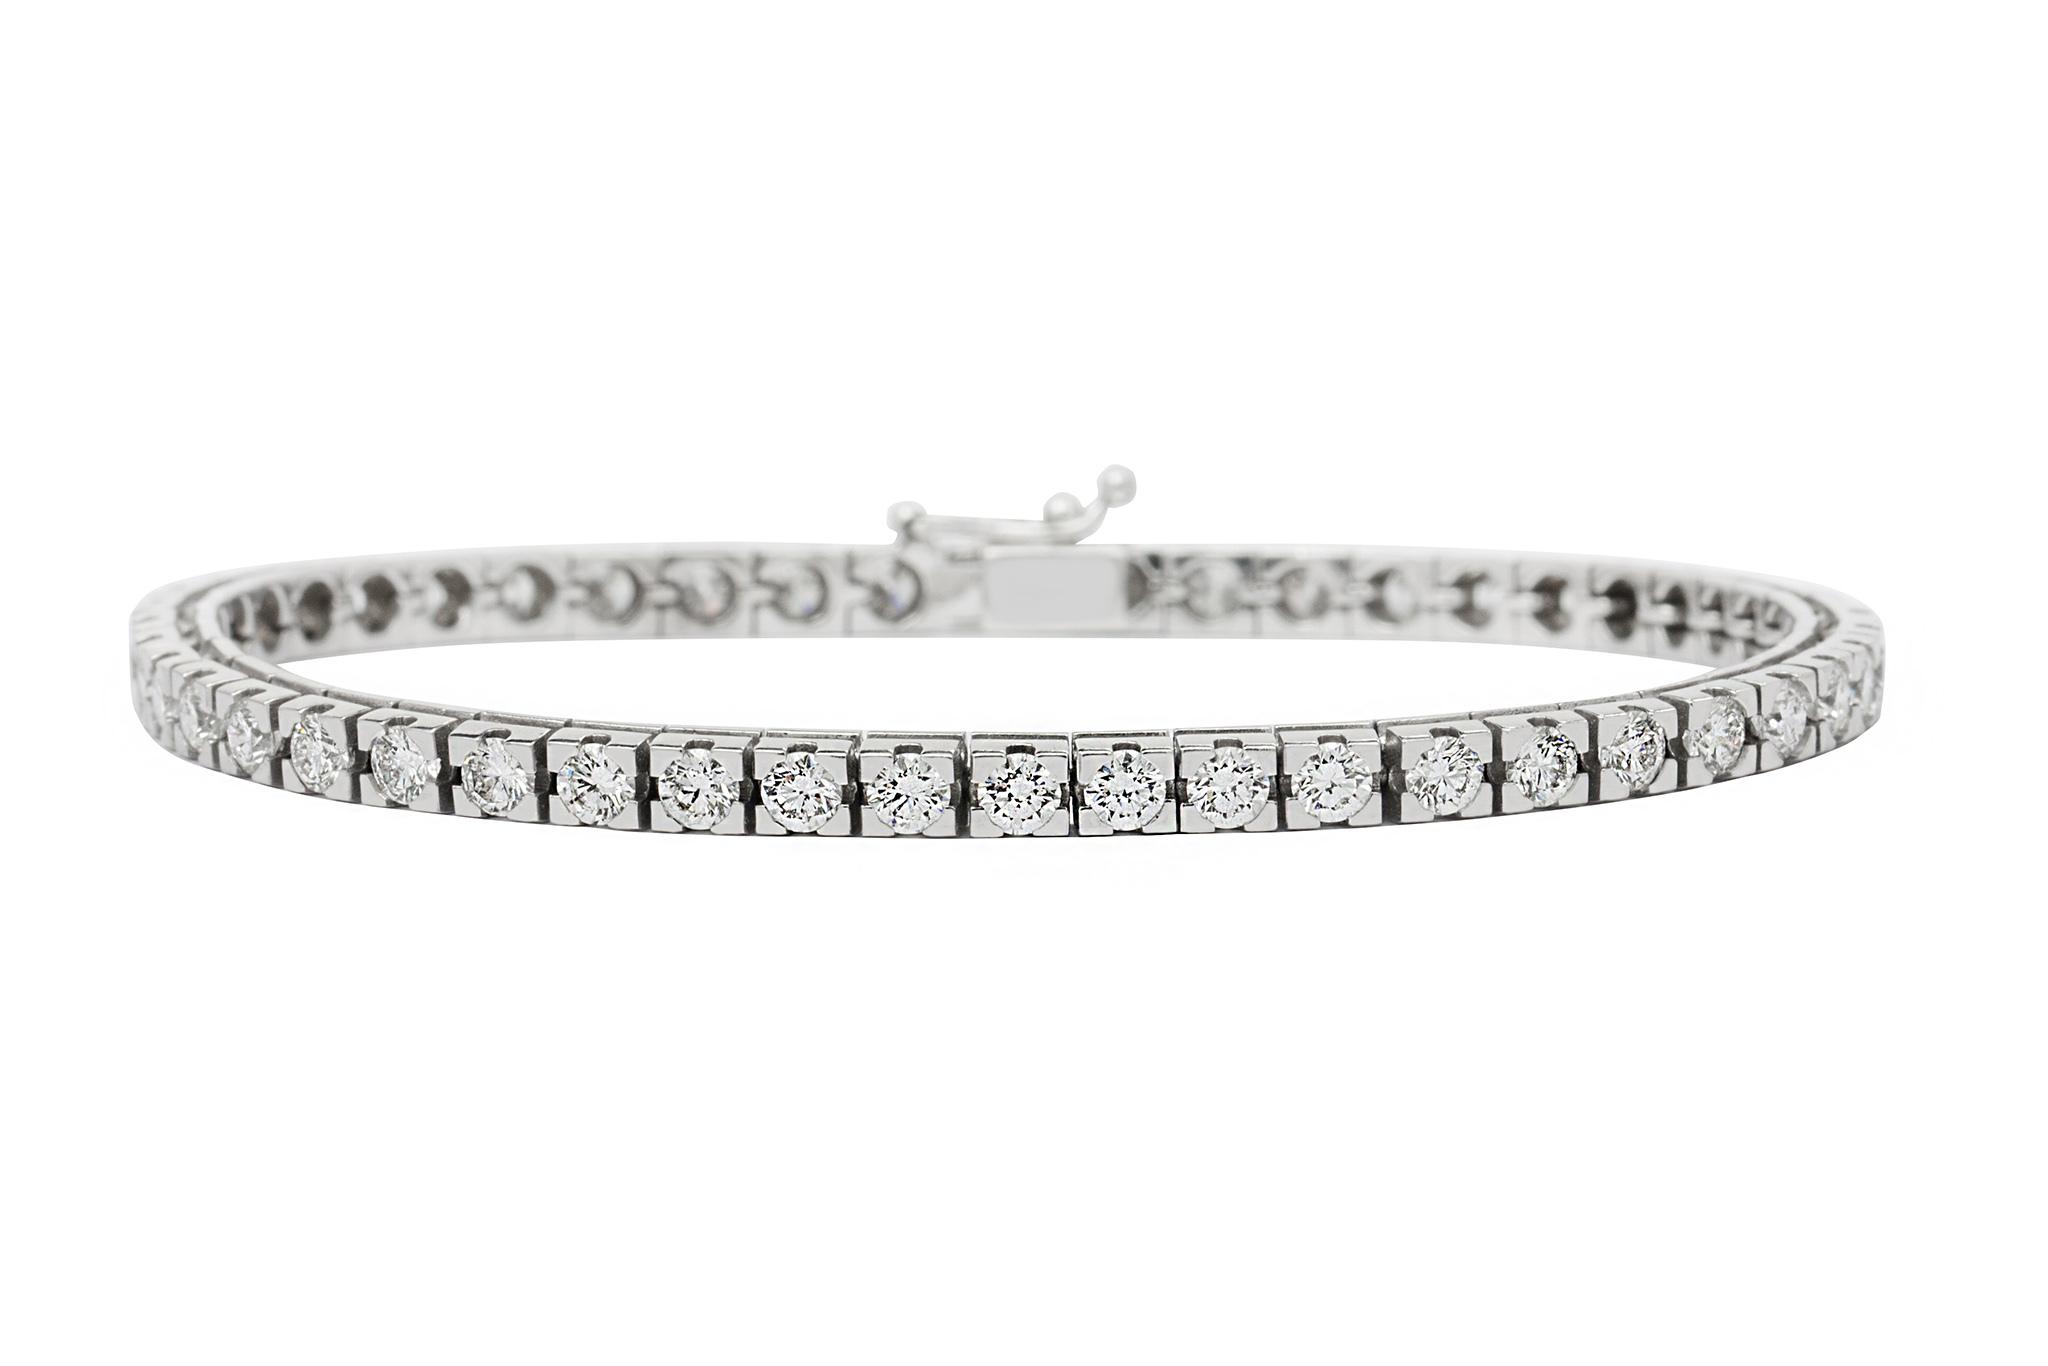 Diamond Bracelets Amp Bangles Kalfin